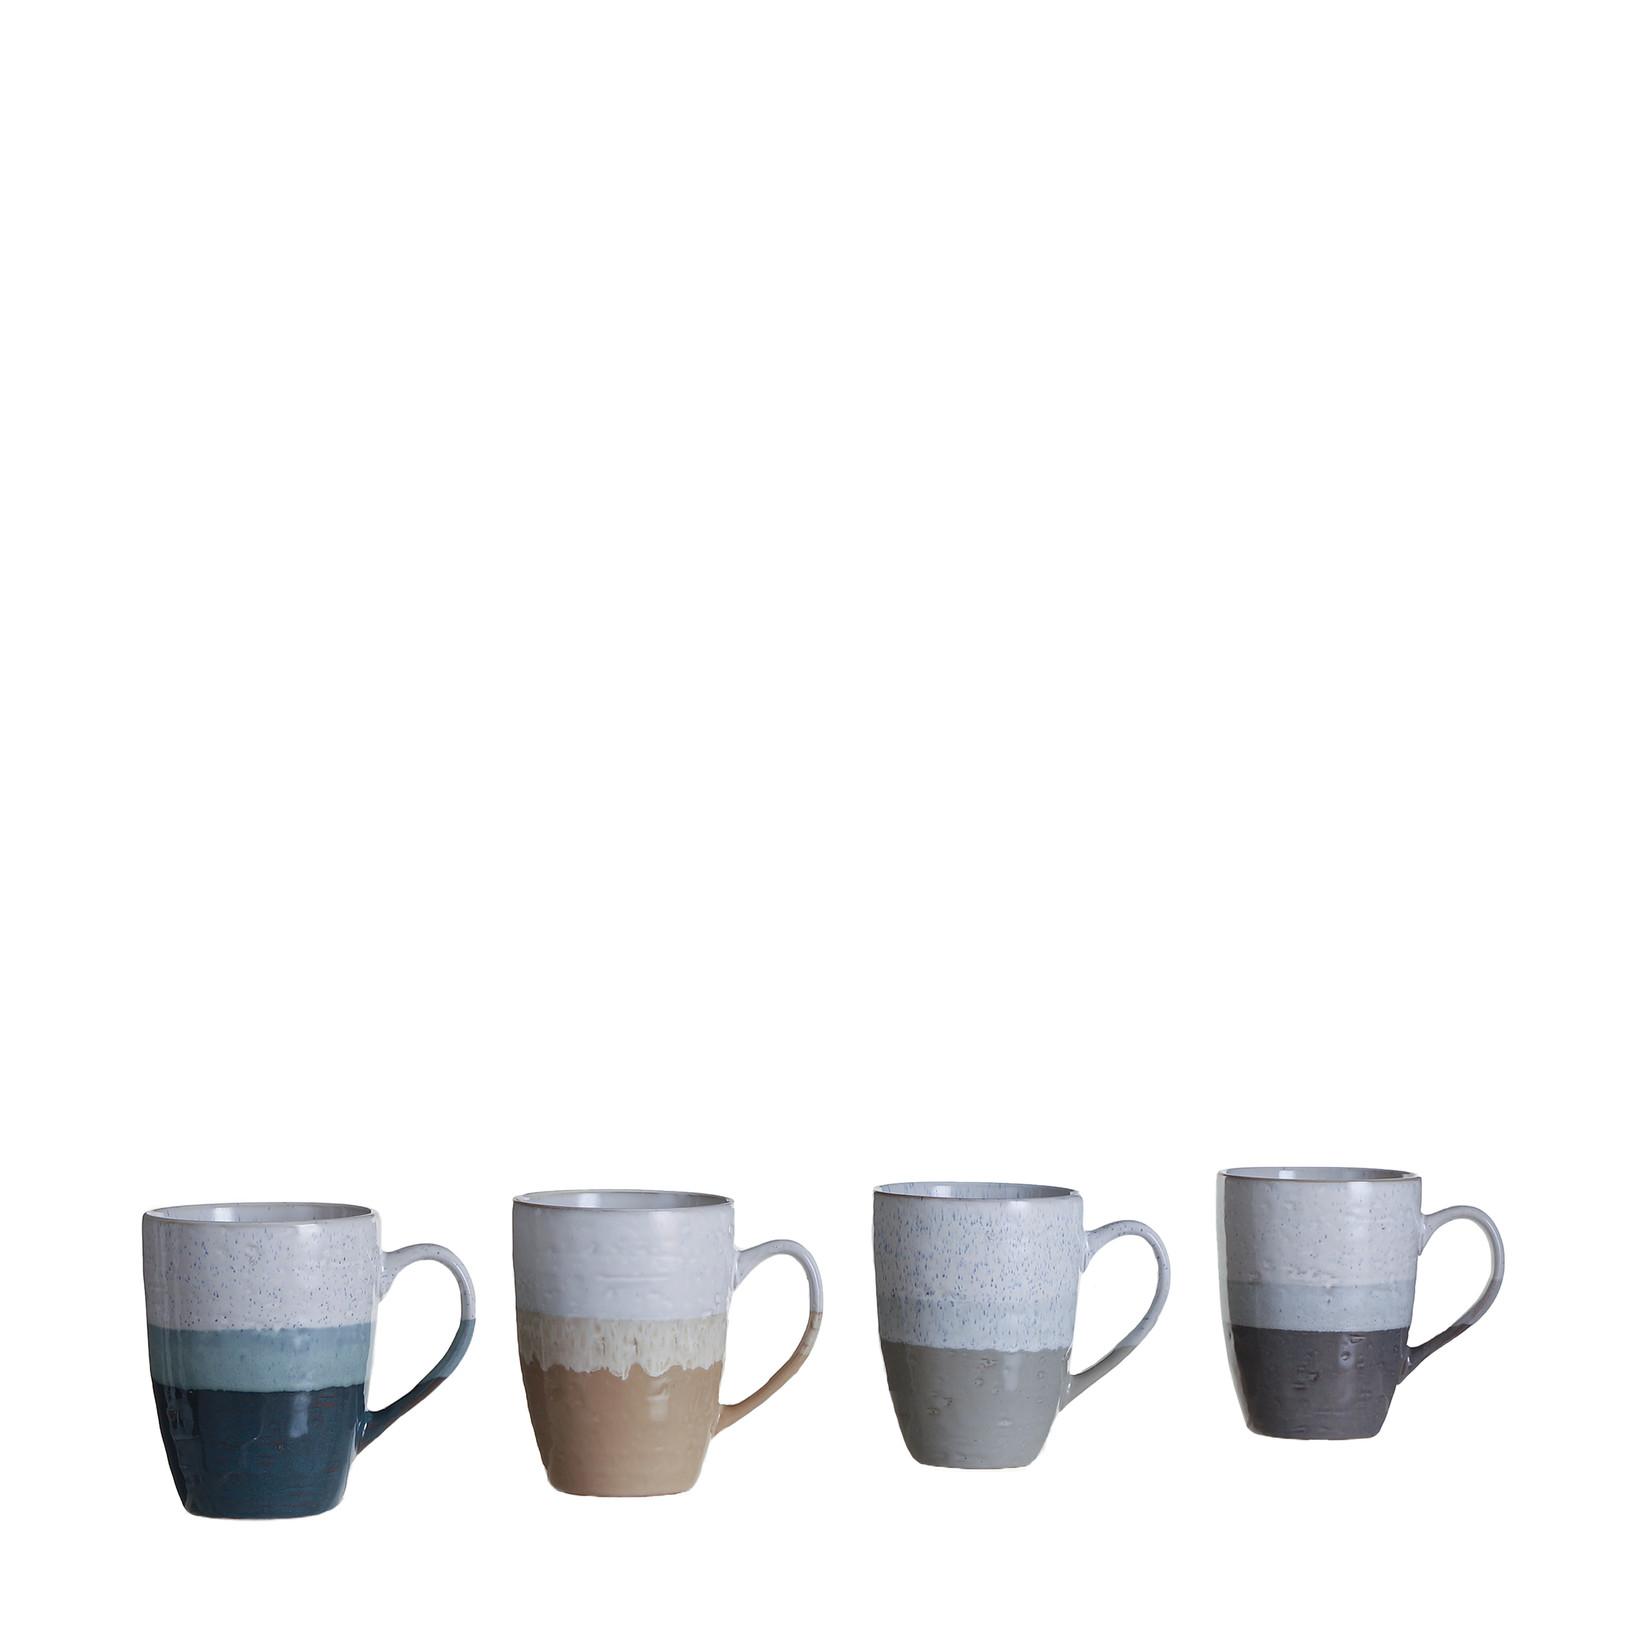 MiCa Tyler mug set of 4